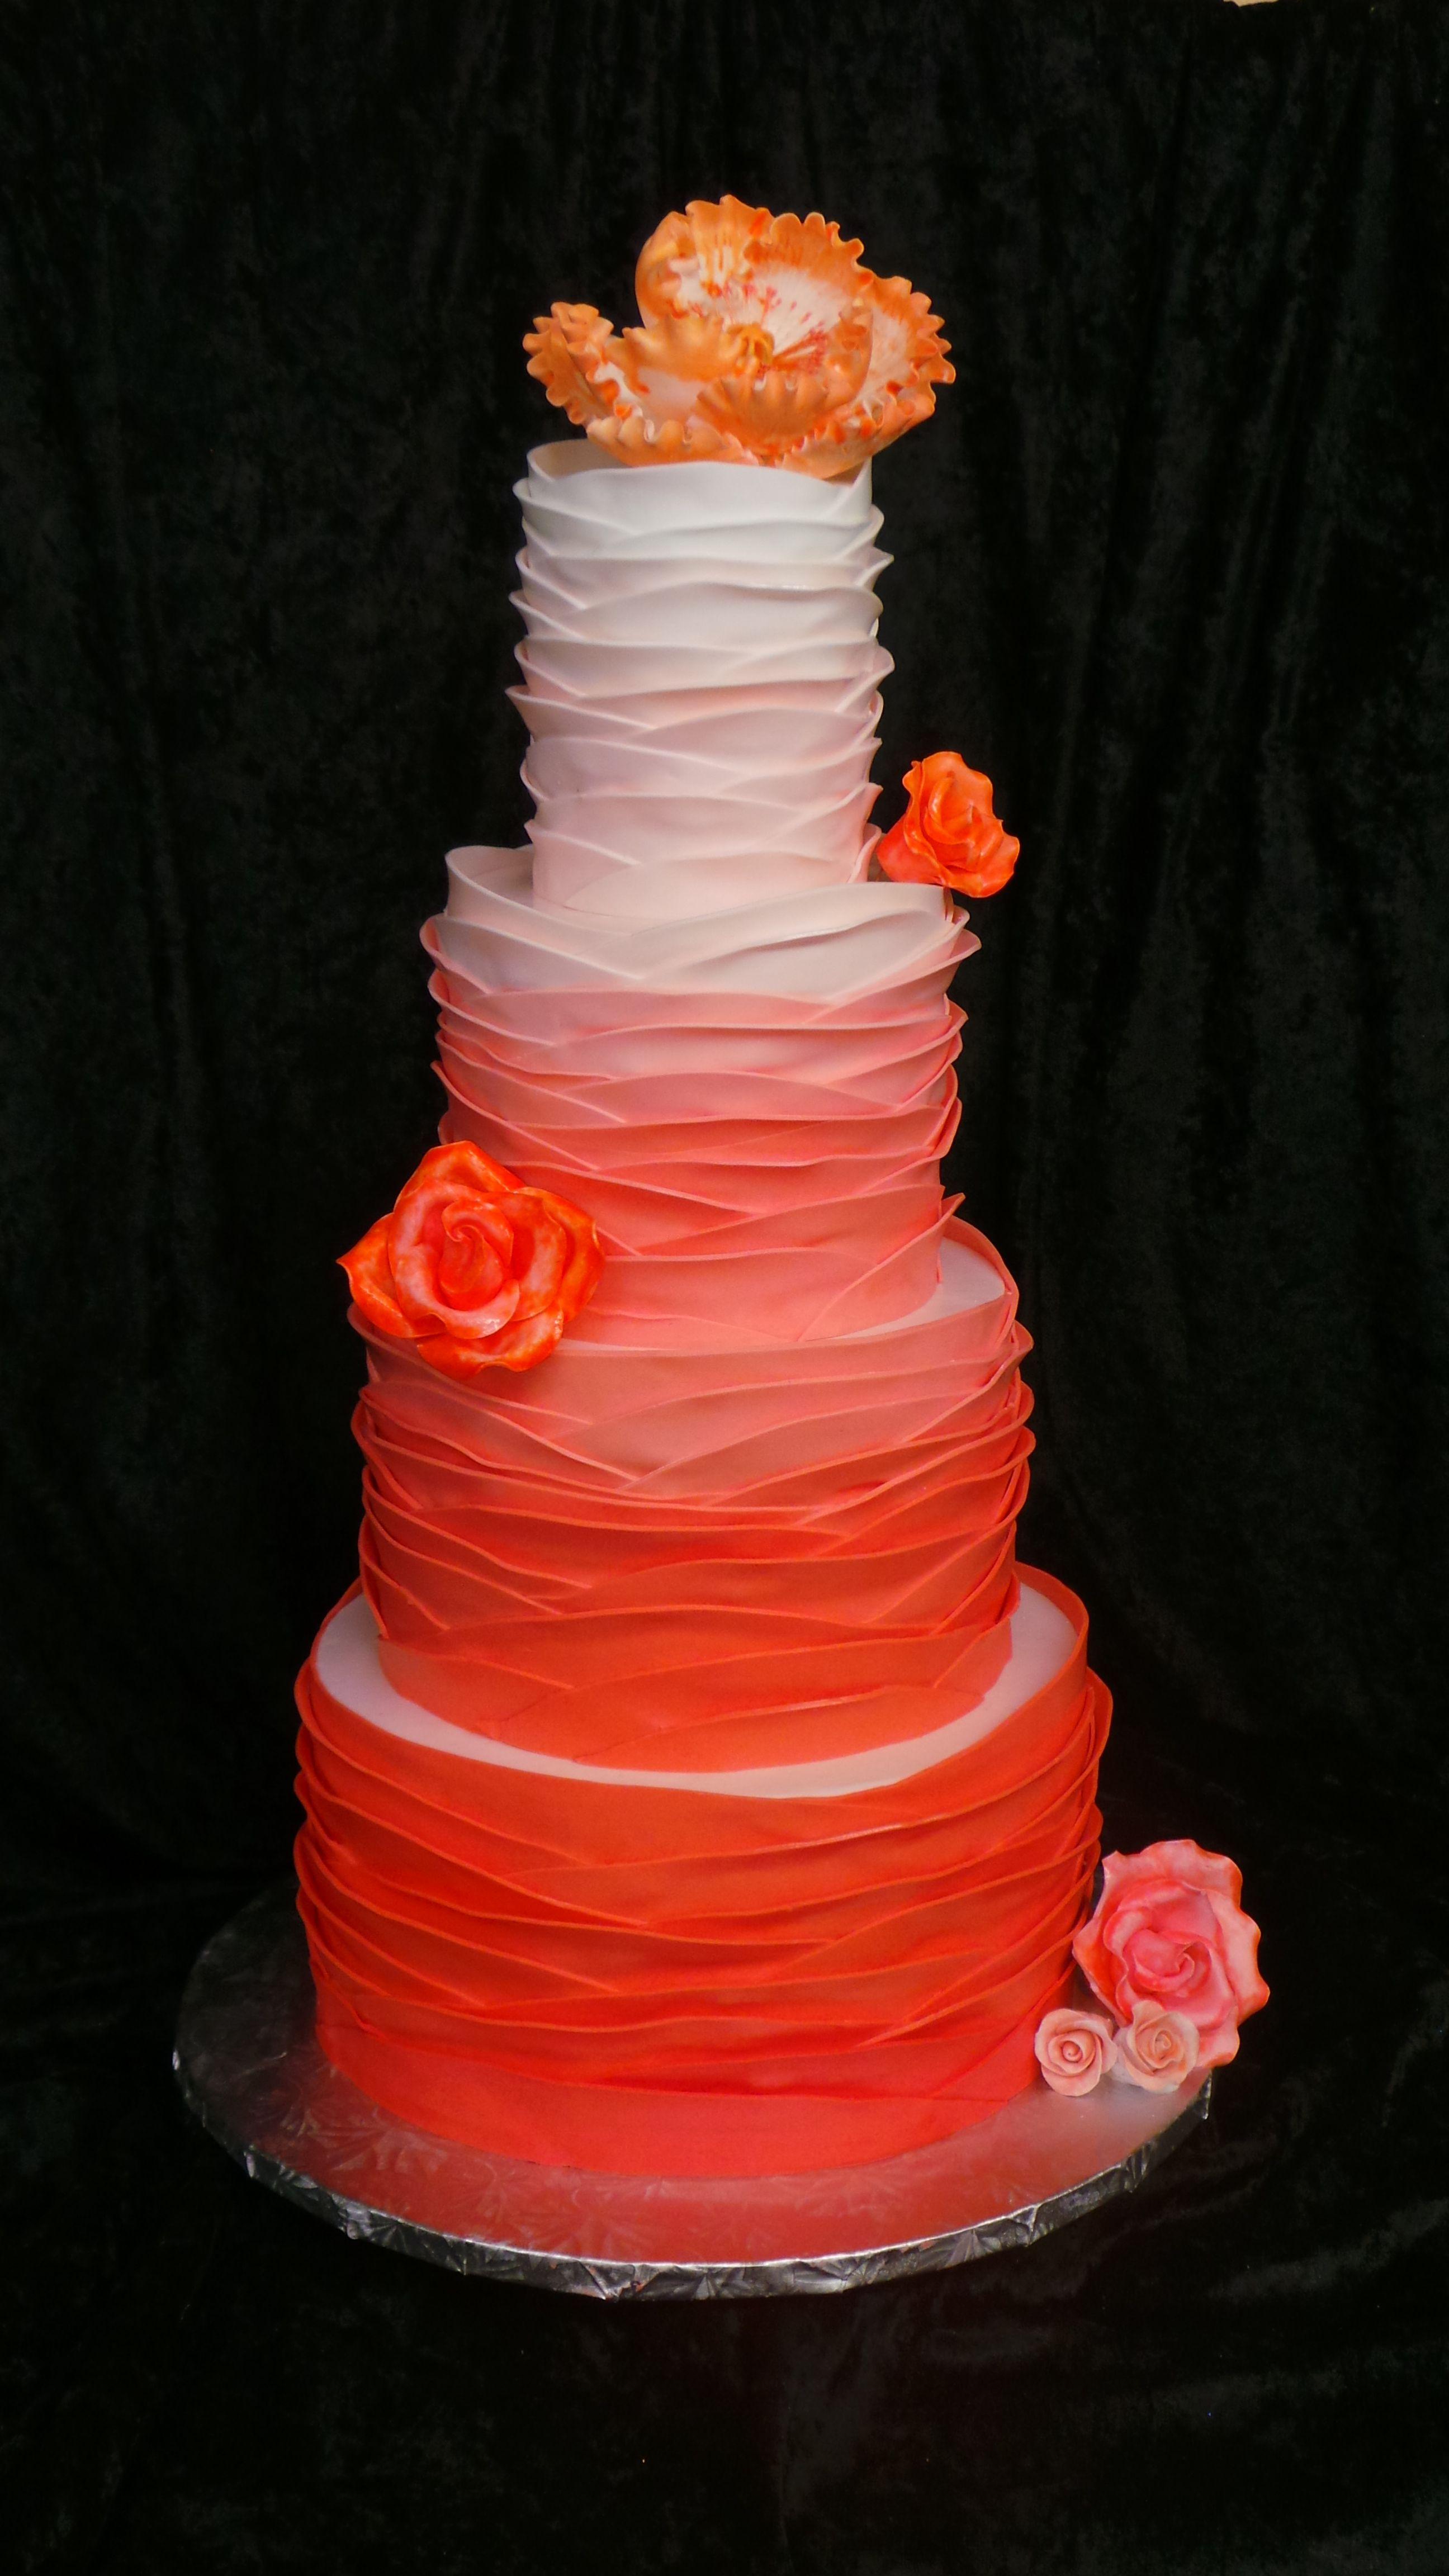 Ombre Orange Coral Peach and White Rose Ruffle Wedding Cake